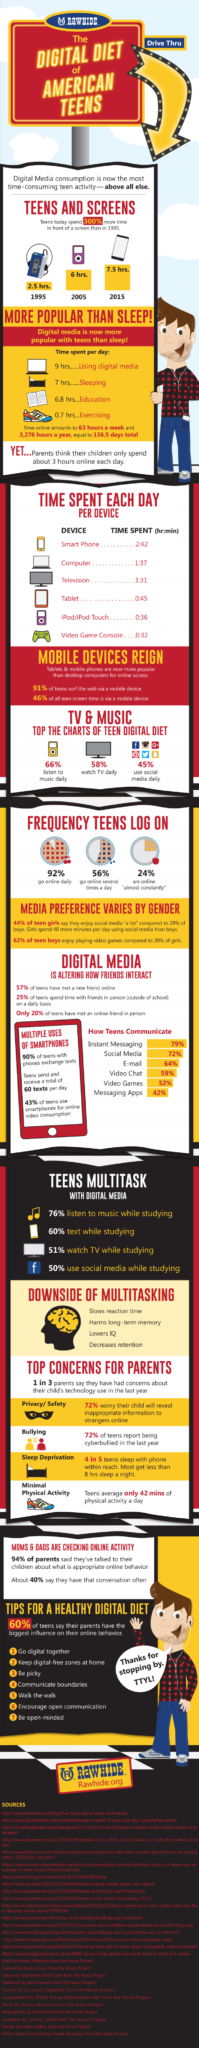 Digital-Diet-Infographic_v7-768x7894